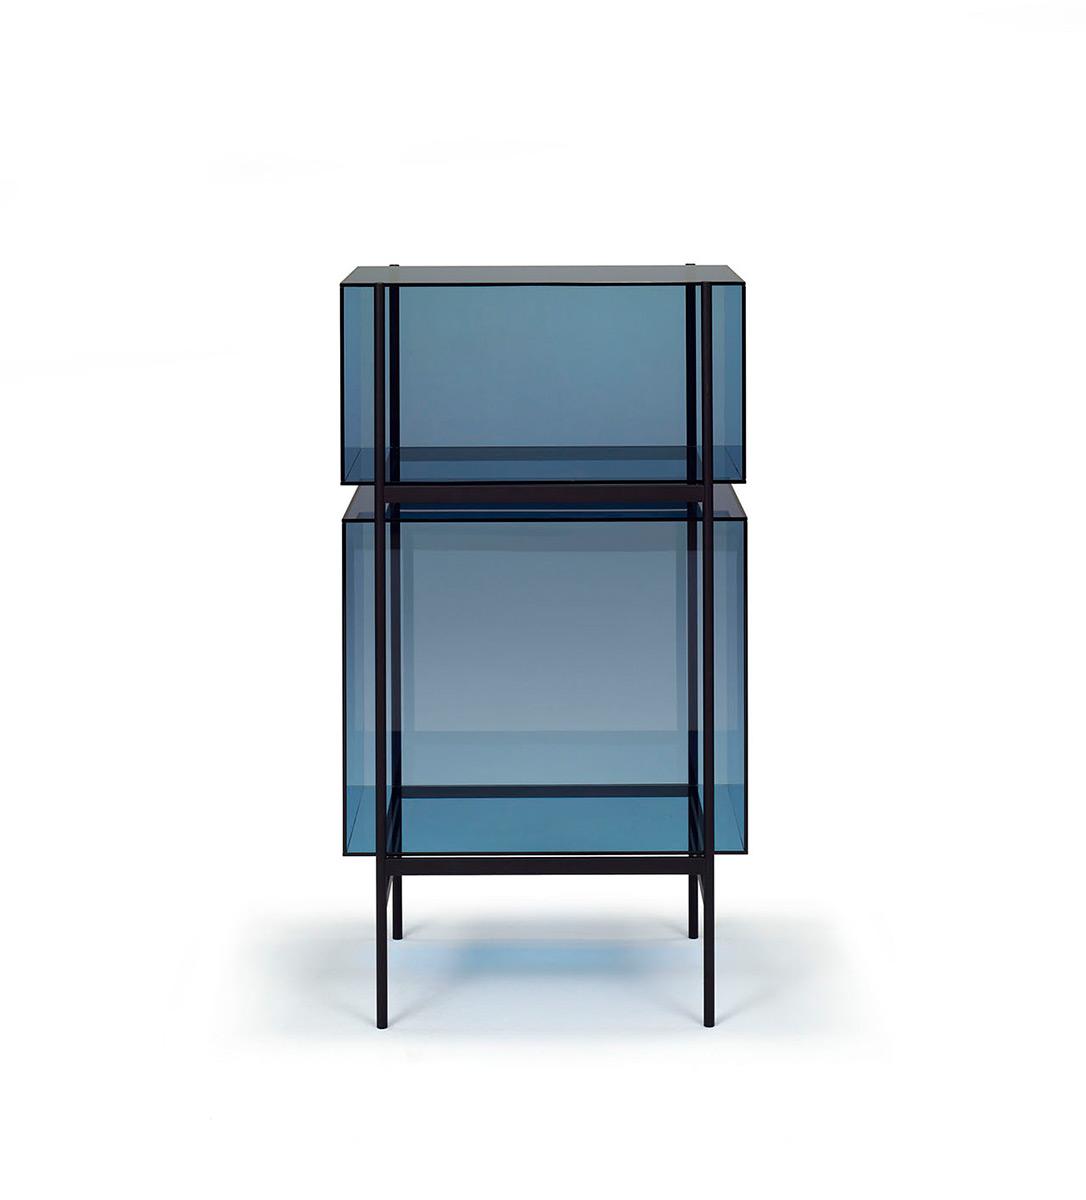 Lyn-collection-Visser-Meijwaard-Pulpo-02